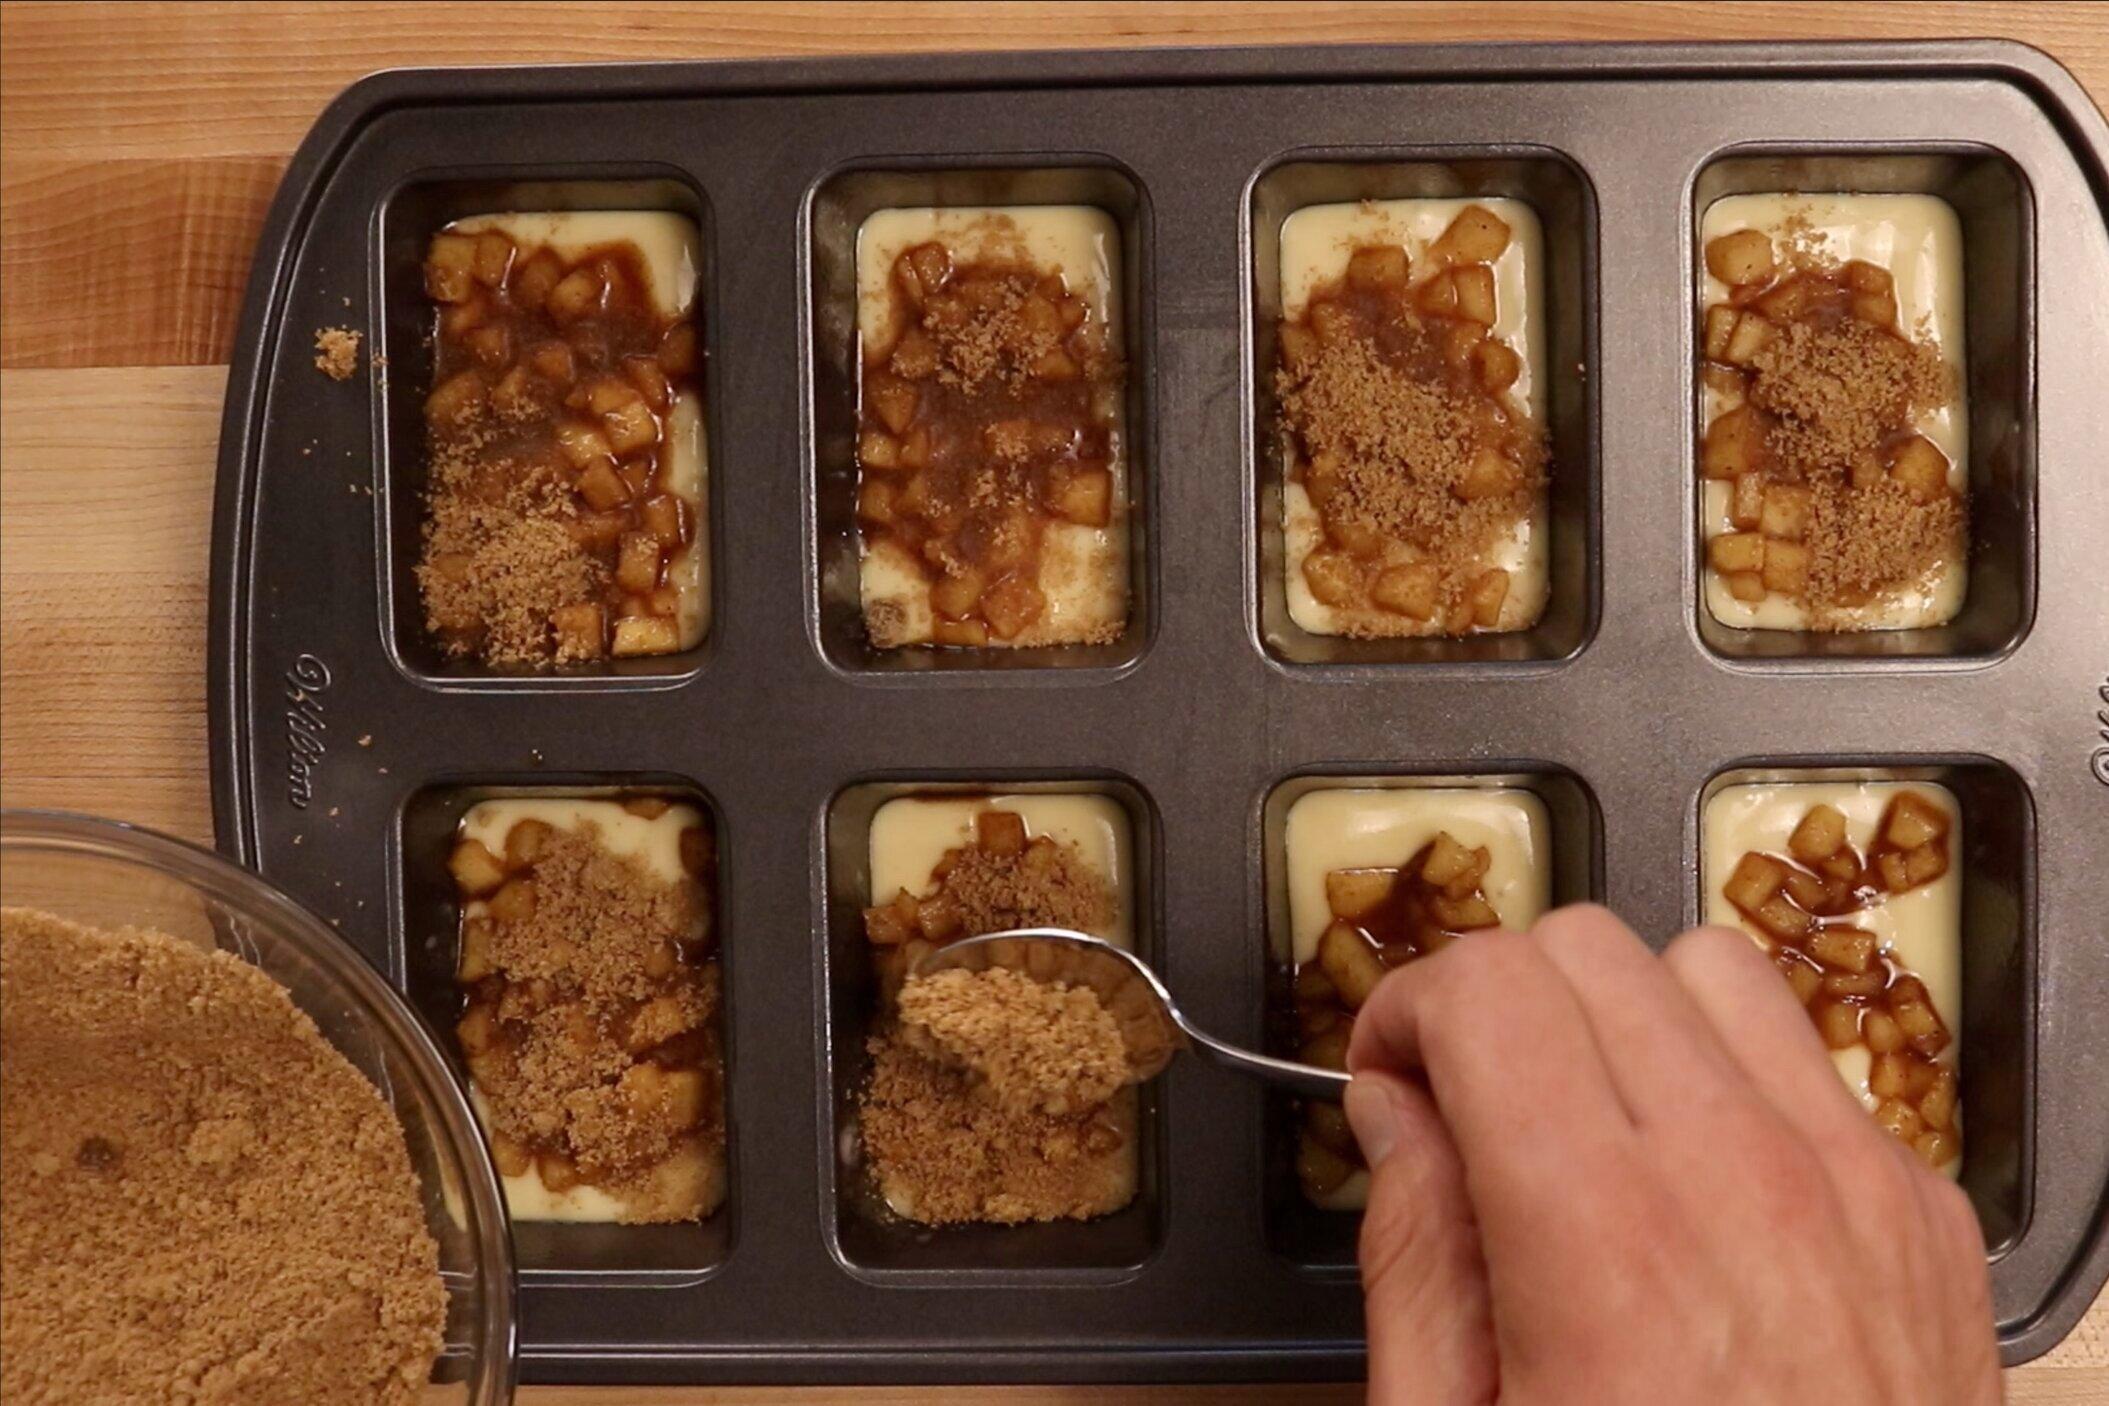 12. Add a teaspoon of the cinnamon-brown sugar mixture to each loaf. -